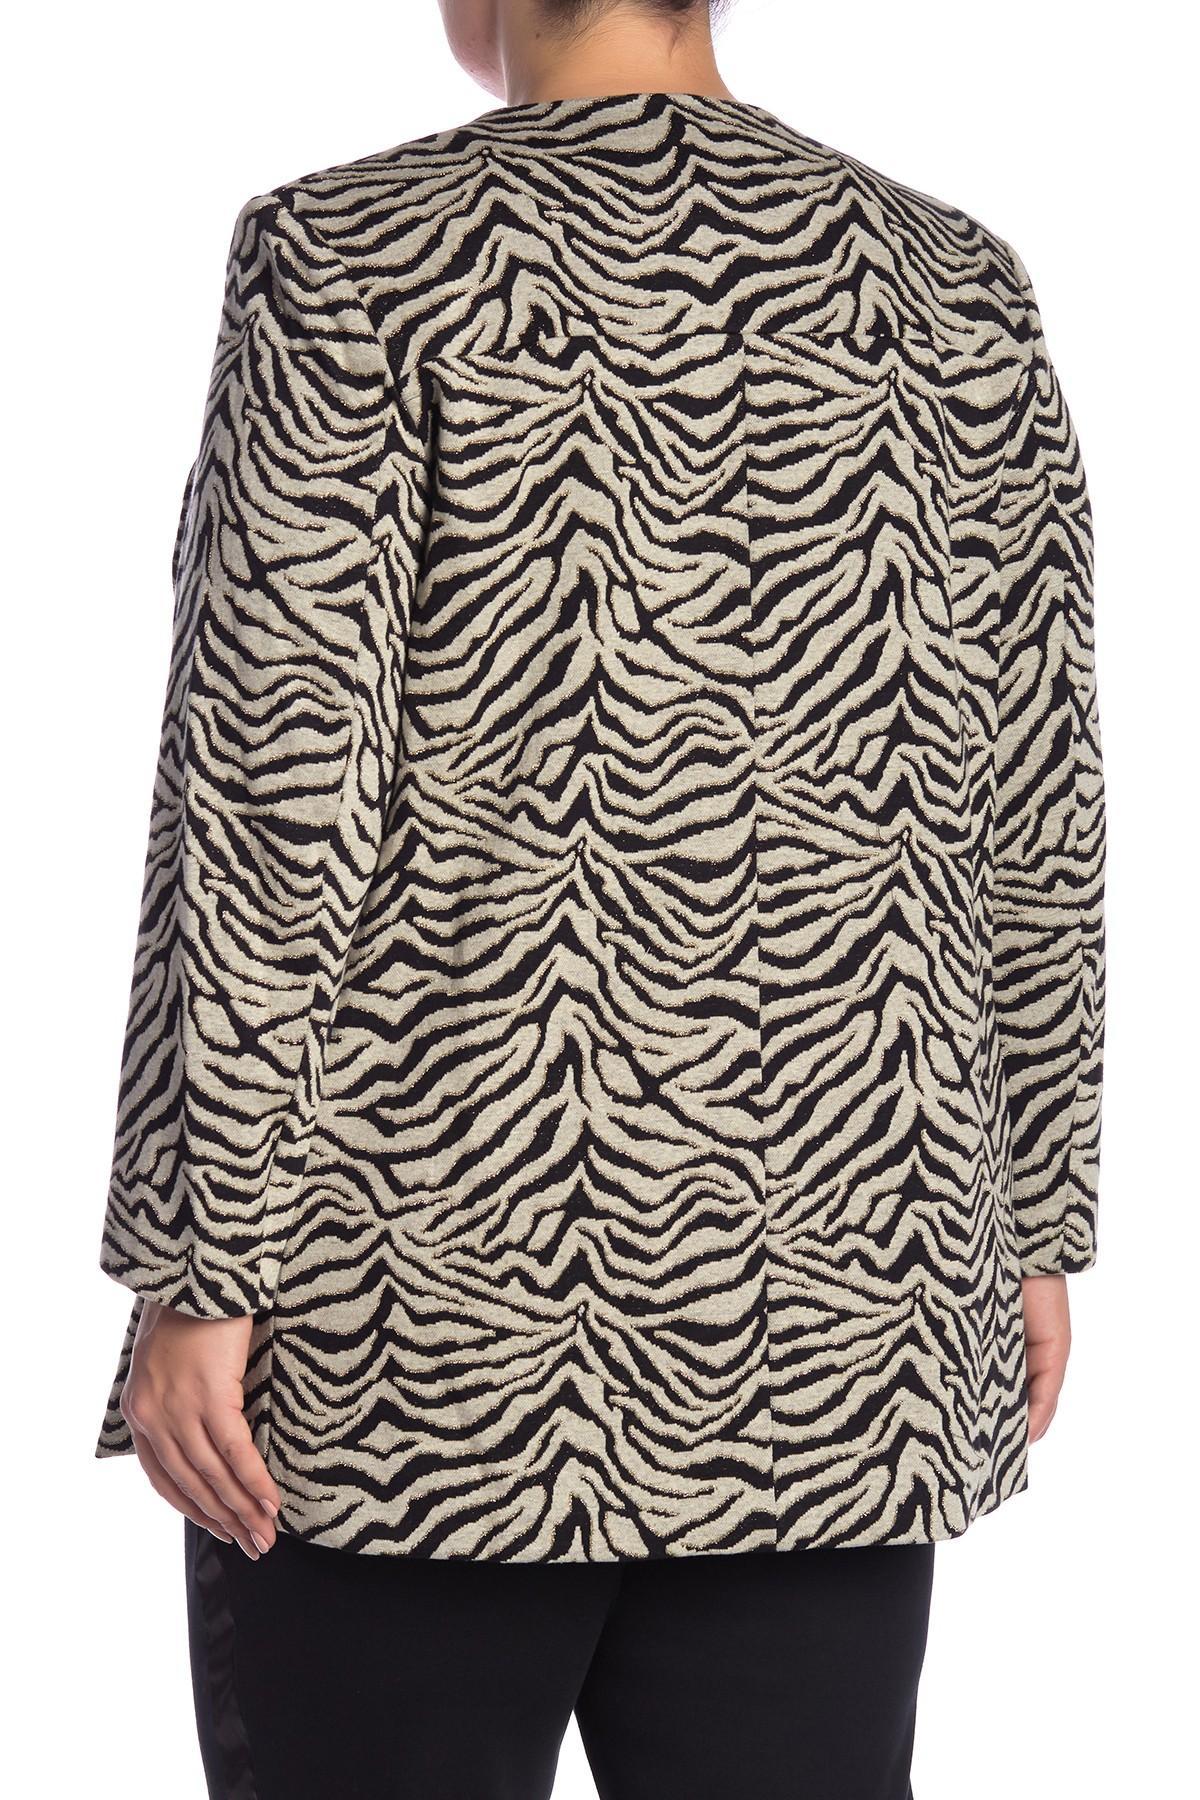 689034859652a Joan Vass - Multicolor Tiger Knit Jacket (plus Size) - Lyst. View fullscreen